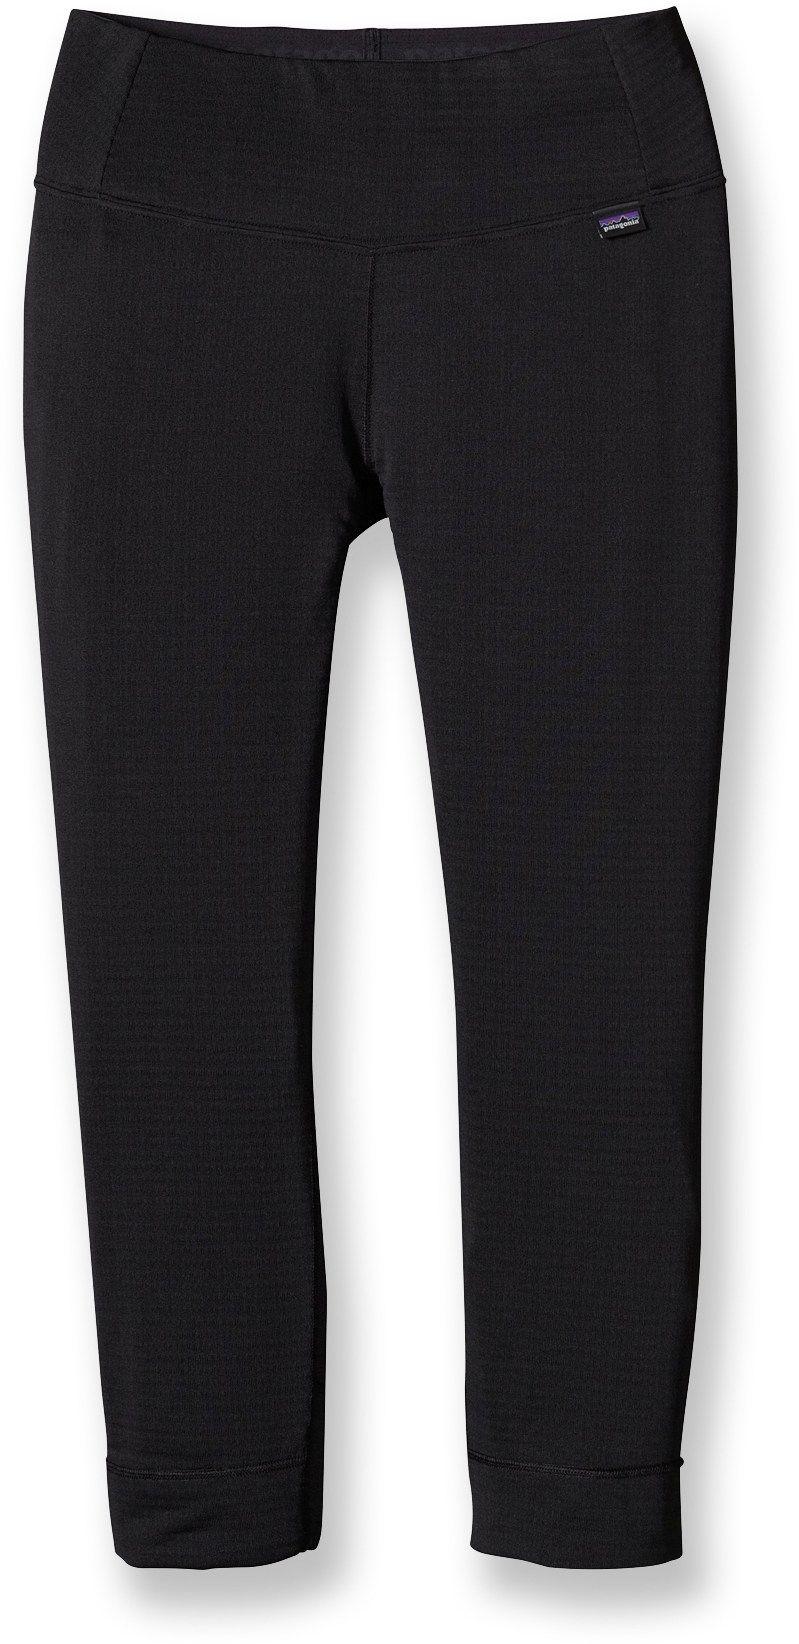 cf3142796b8d91 Patagonia Female Capilene Thermal Weight Boot-Length Long Underwear Bottoms  - Women's